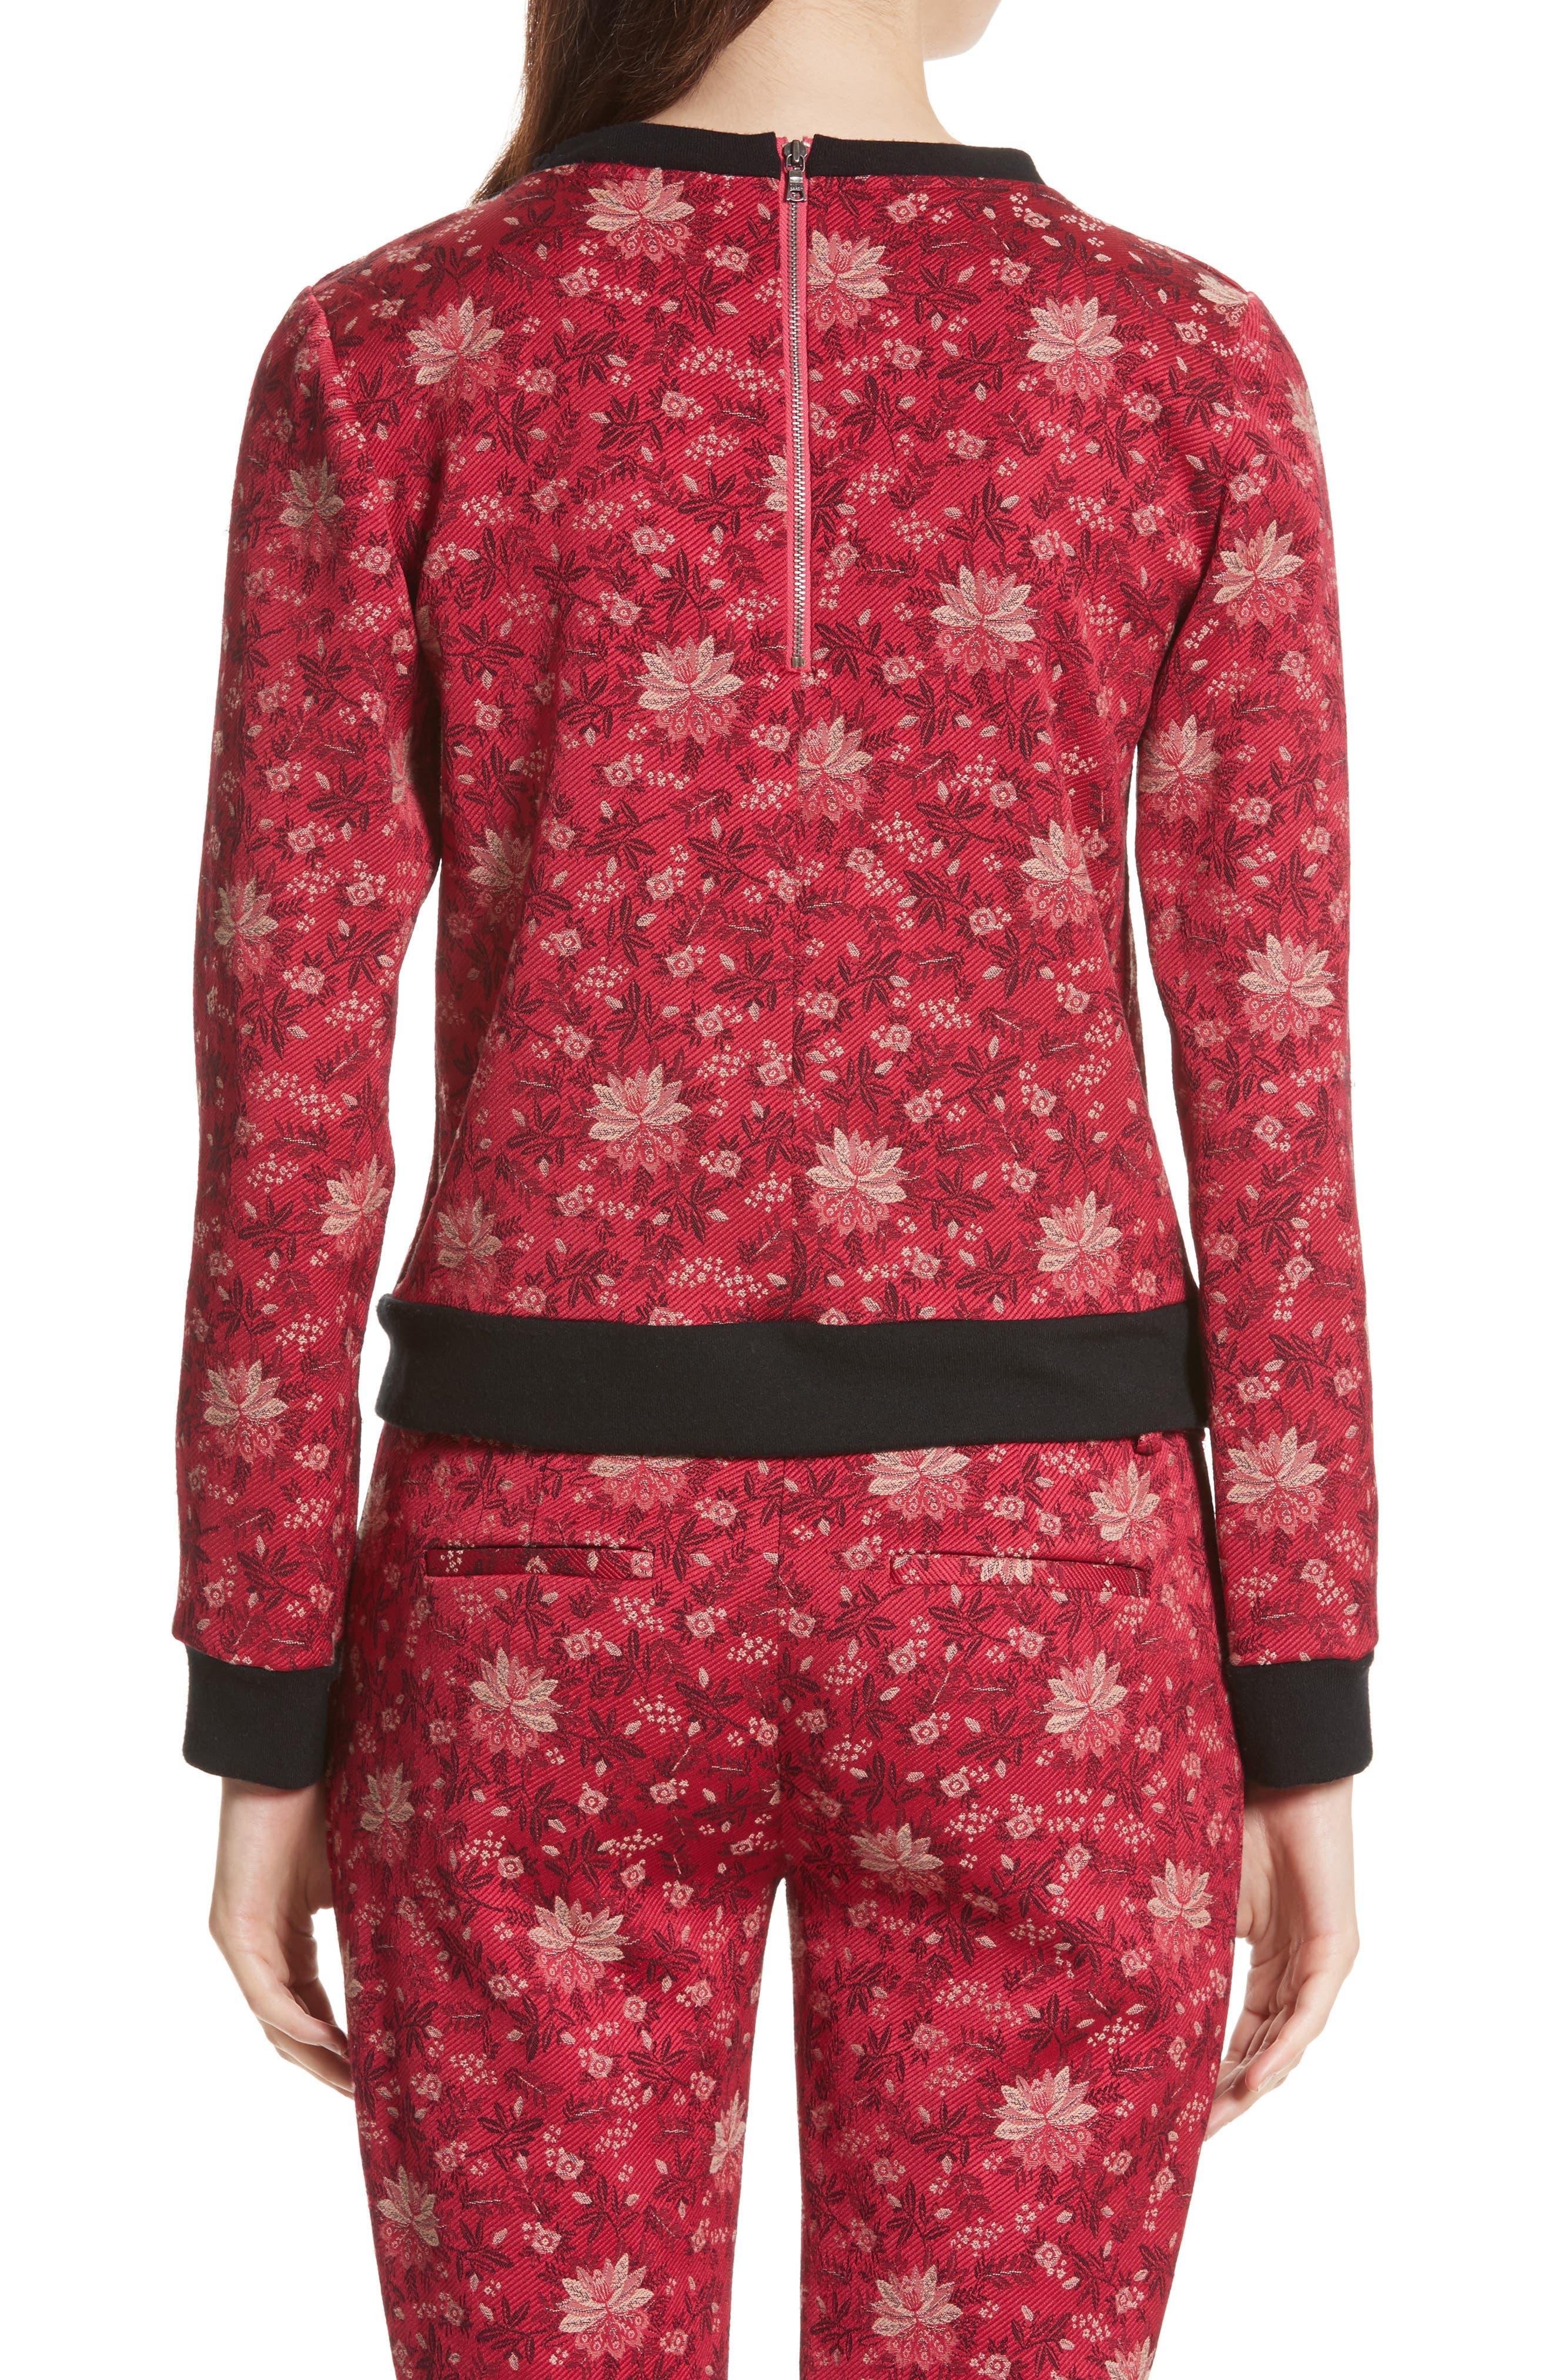 Marylou Floral Jacquard Sweatshirt,                             Alternate thumbnail 2, color,                             650